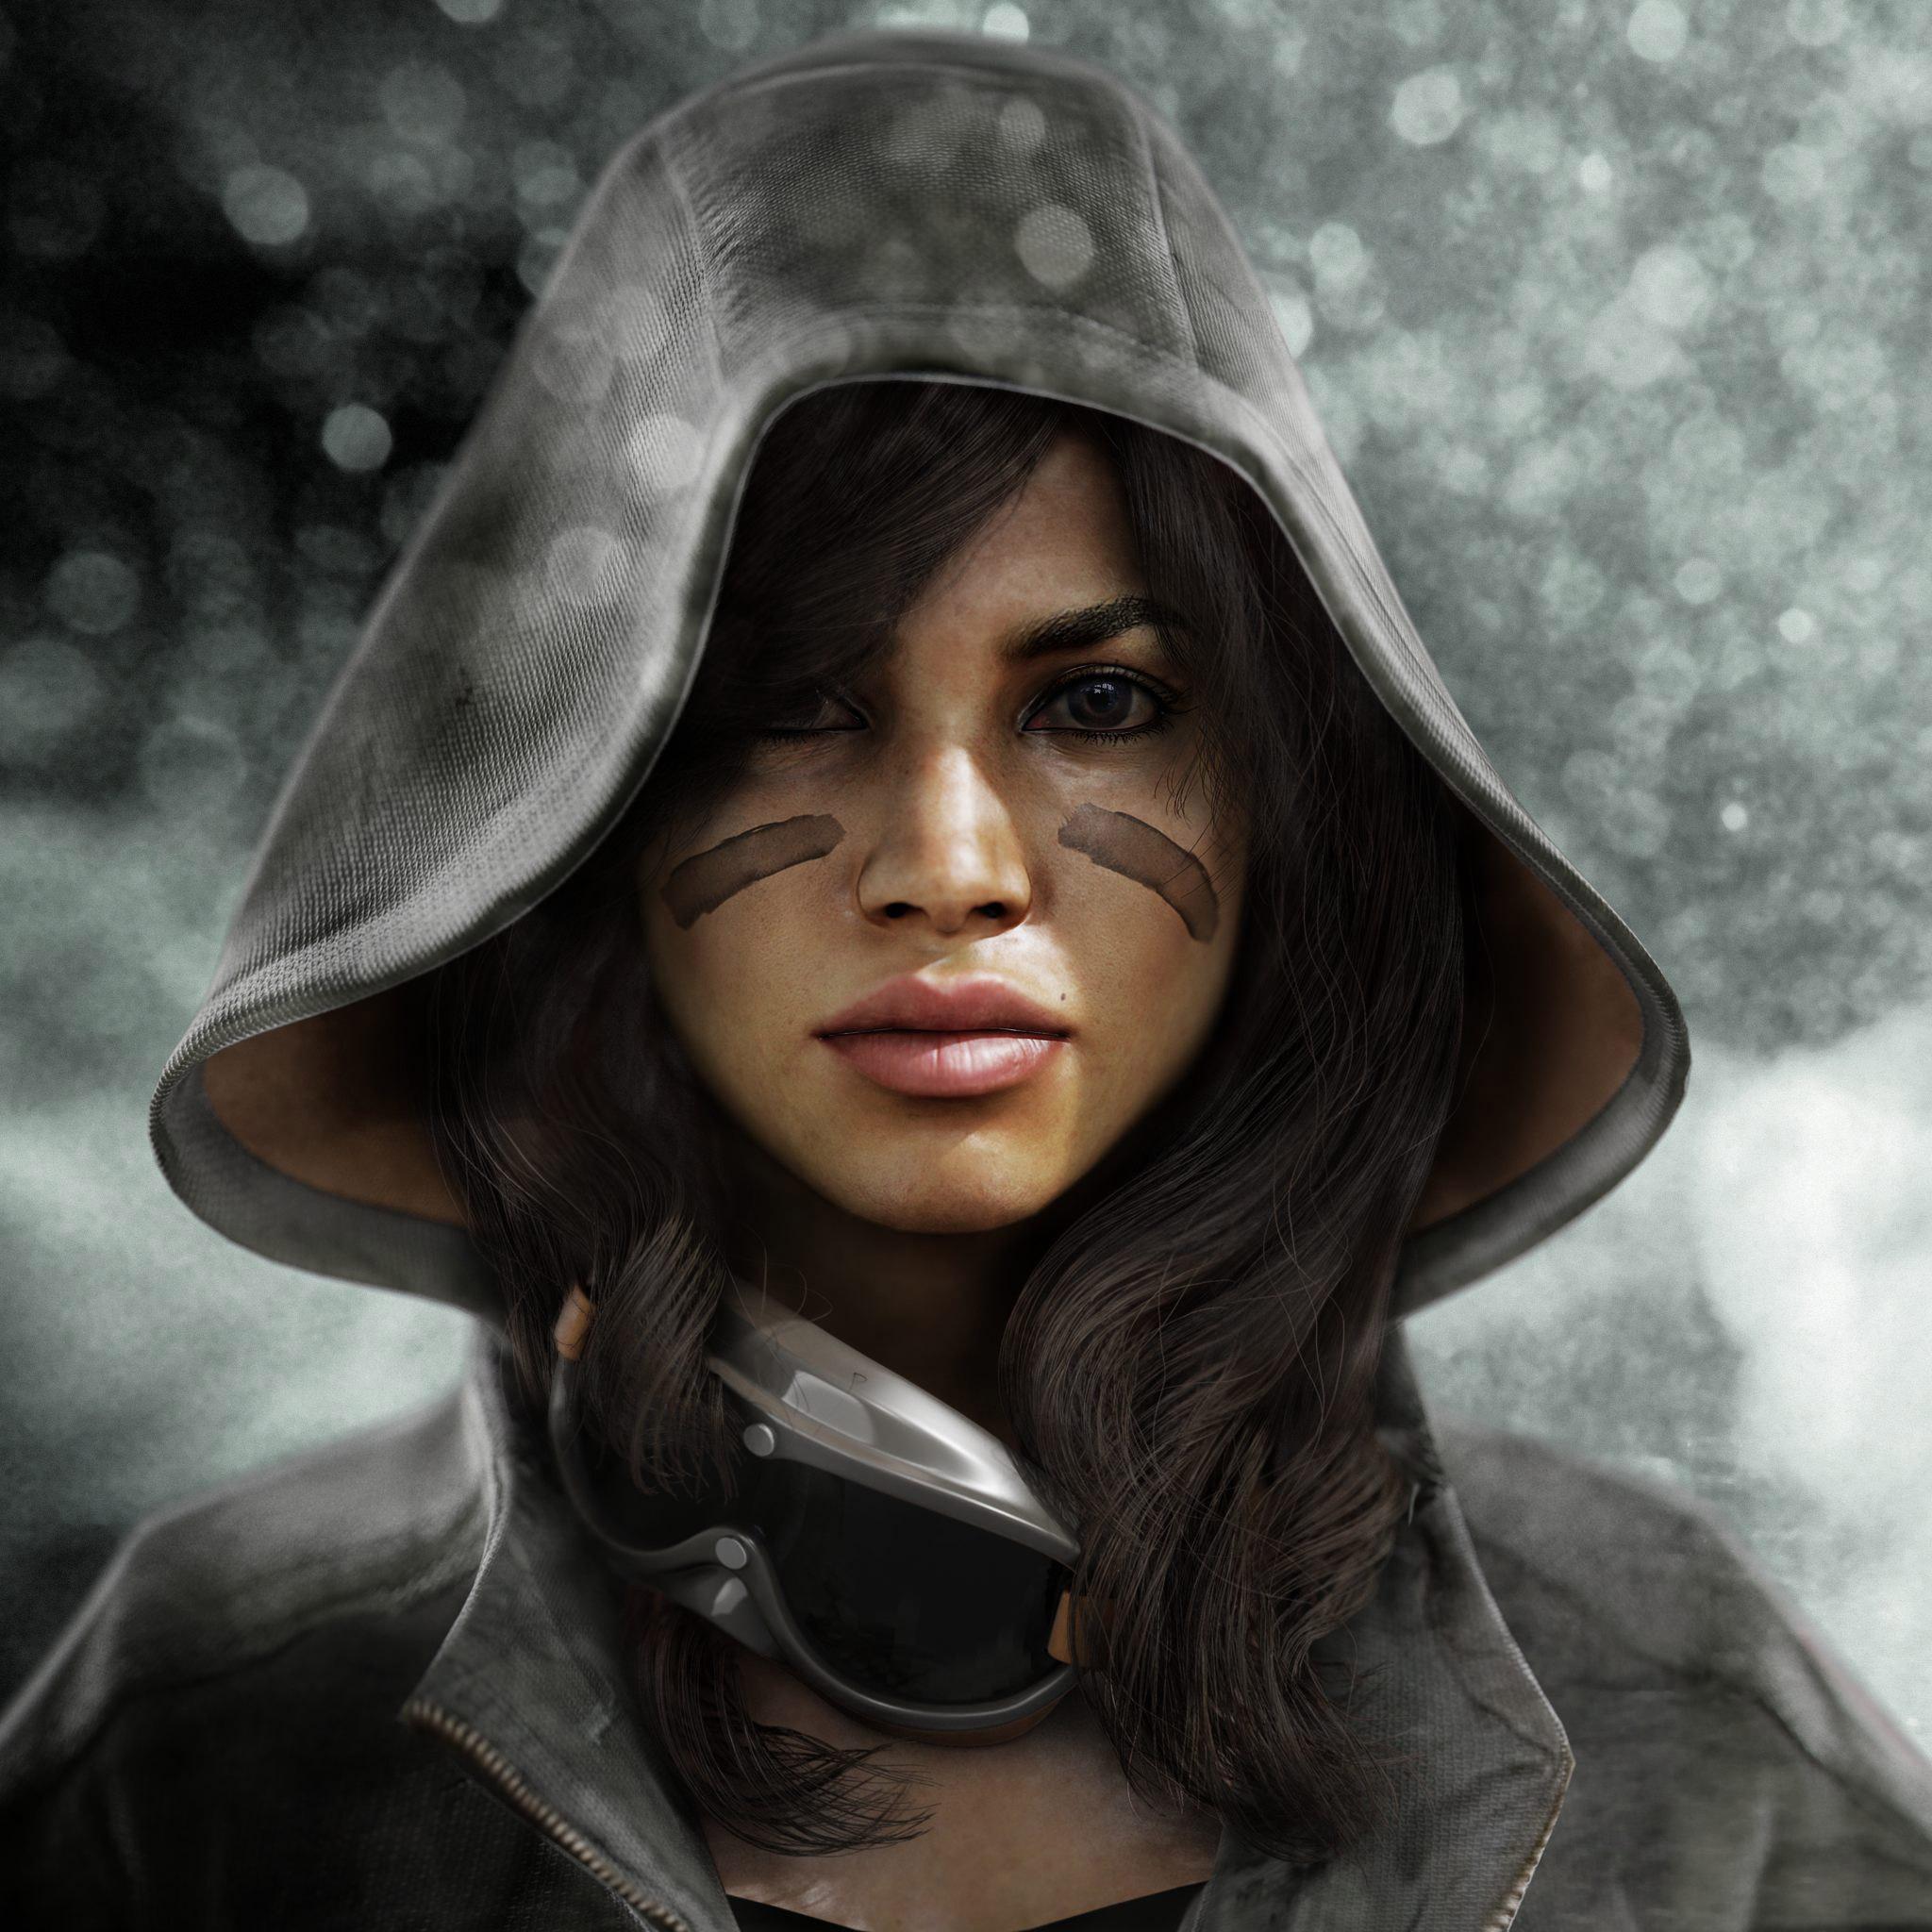 Portrait Wallpaper: Killzone 3 Character